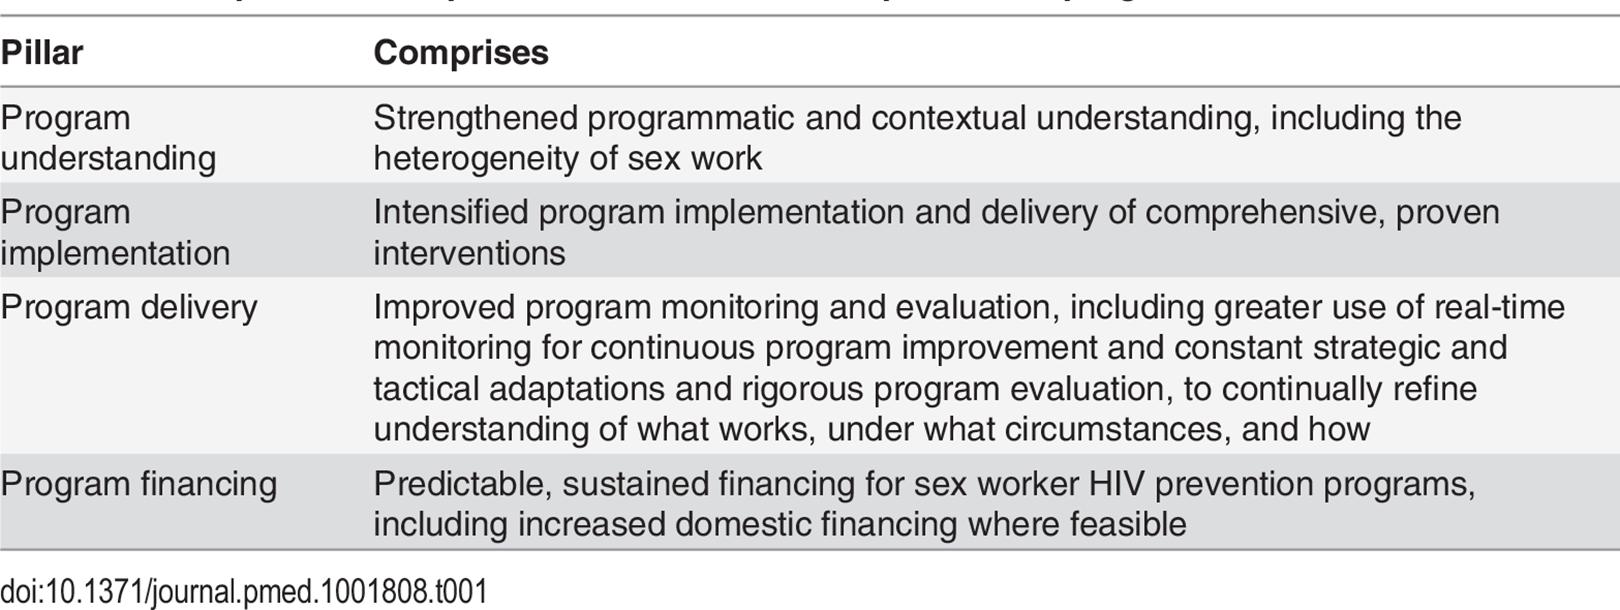 Principles of a comprehensive sex worker HIV prevention program.